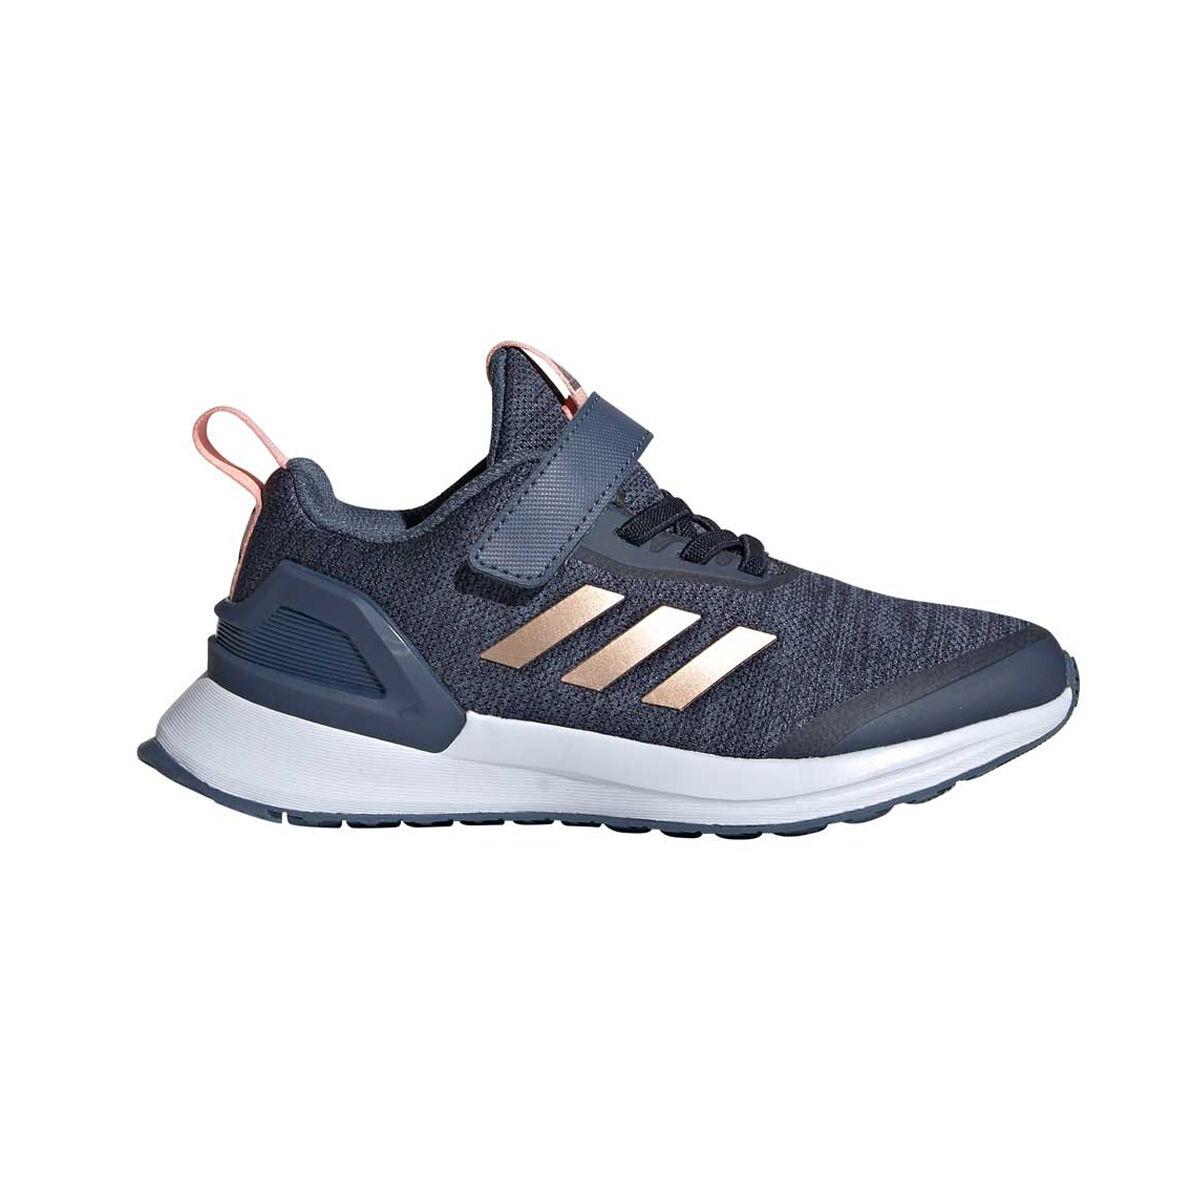 adidas RapidaRun X Kids Running Shoes Blue Pink US 12